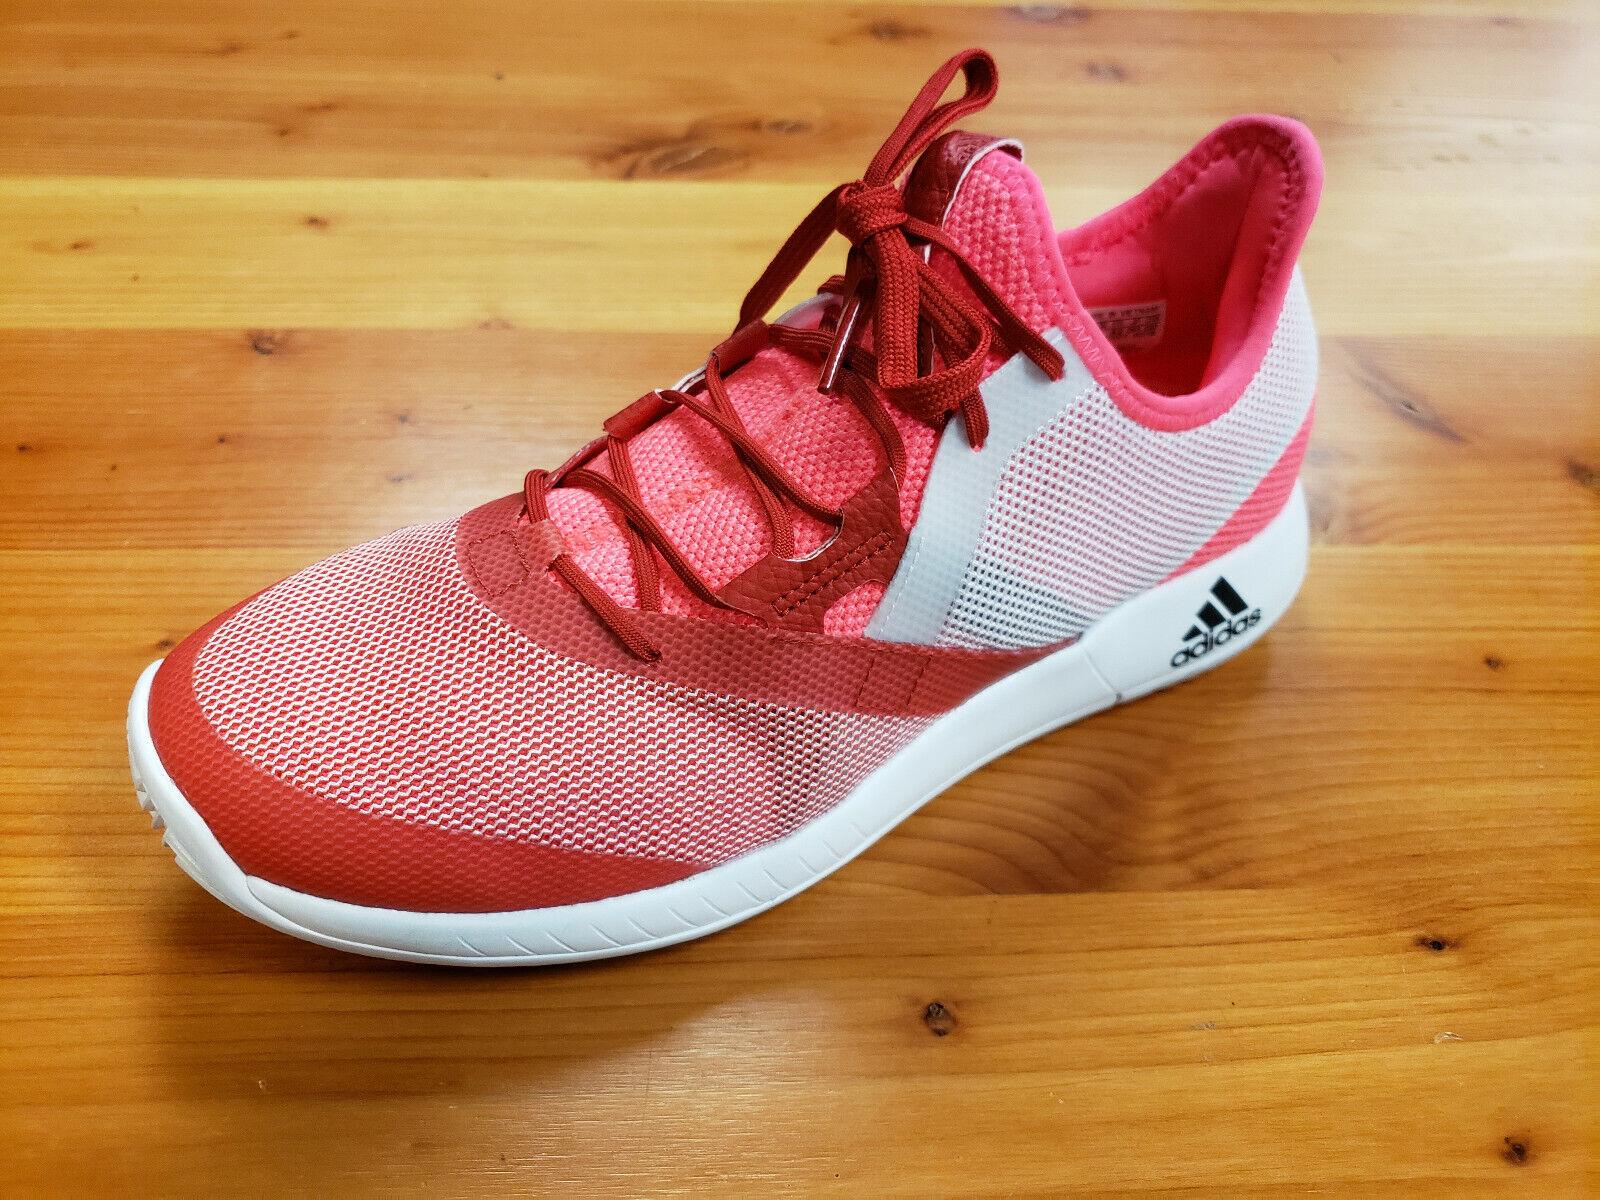 Women's Adidas Adizero Defiant Bounce Preowned Tennis shoes Size 9.5